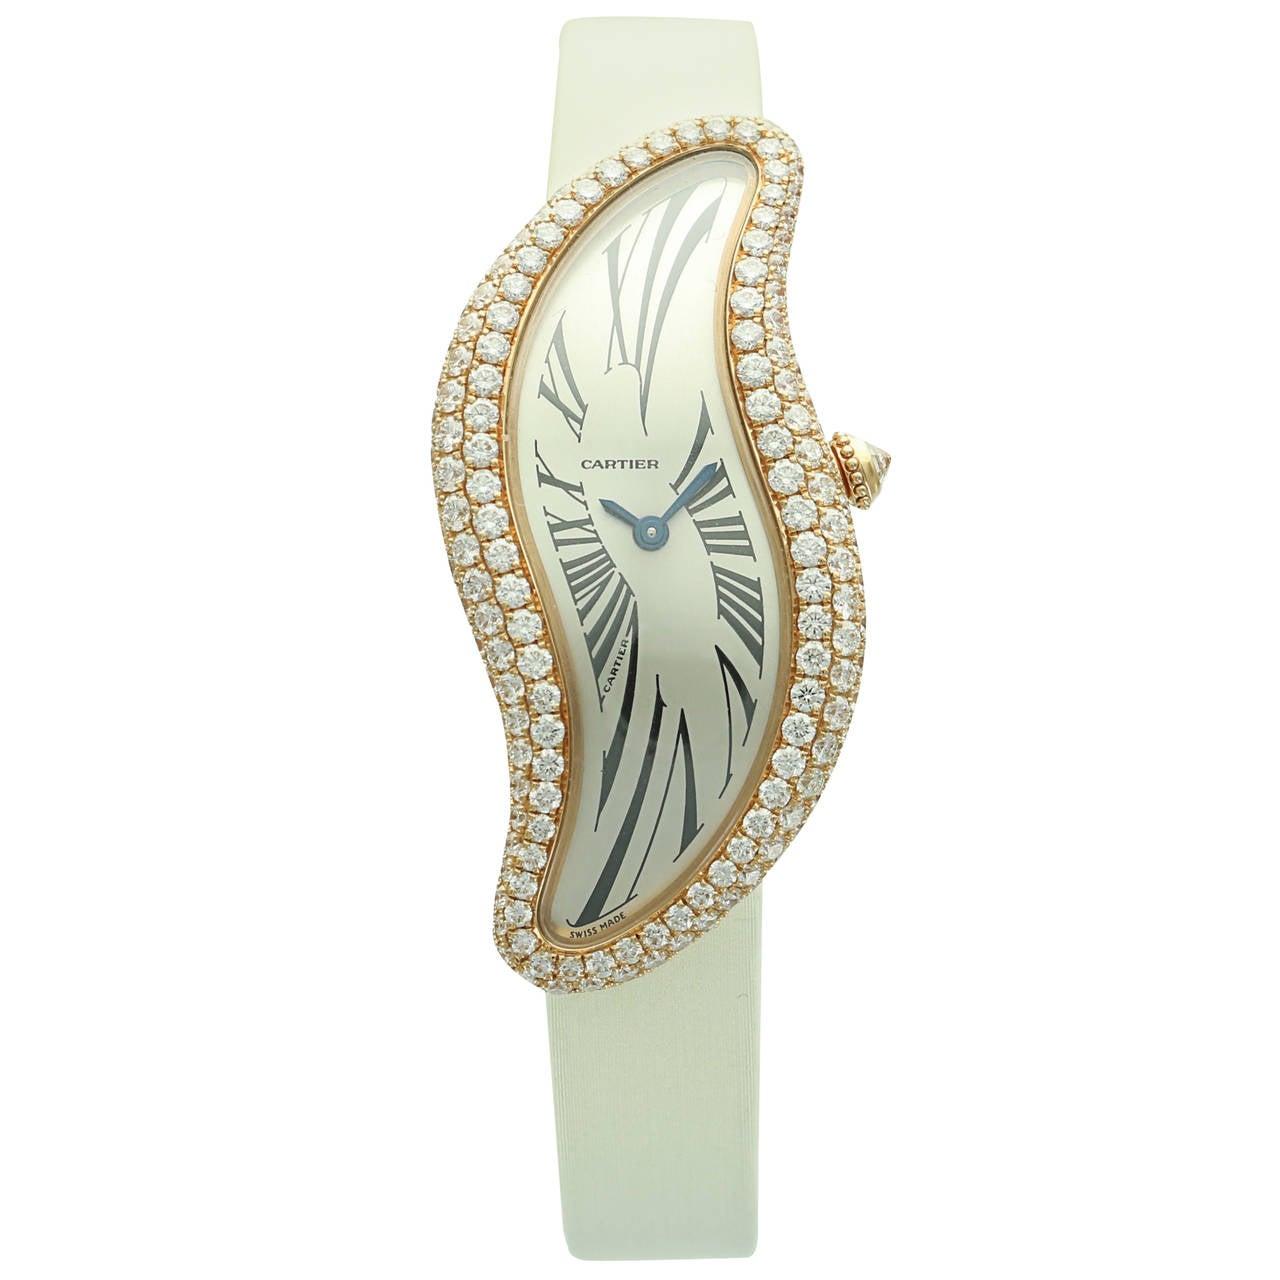 Cartier Lady's Rose Gold Baignoire Wristwatch Ref 3248 1